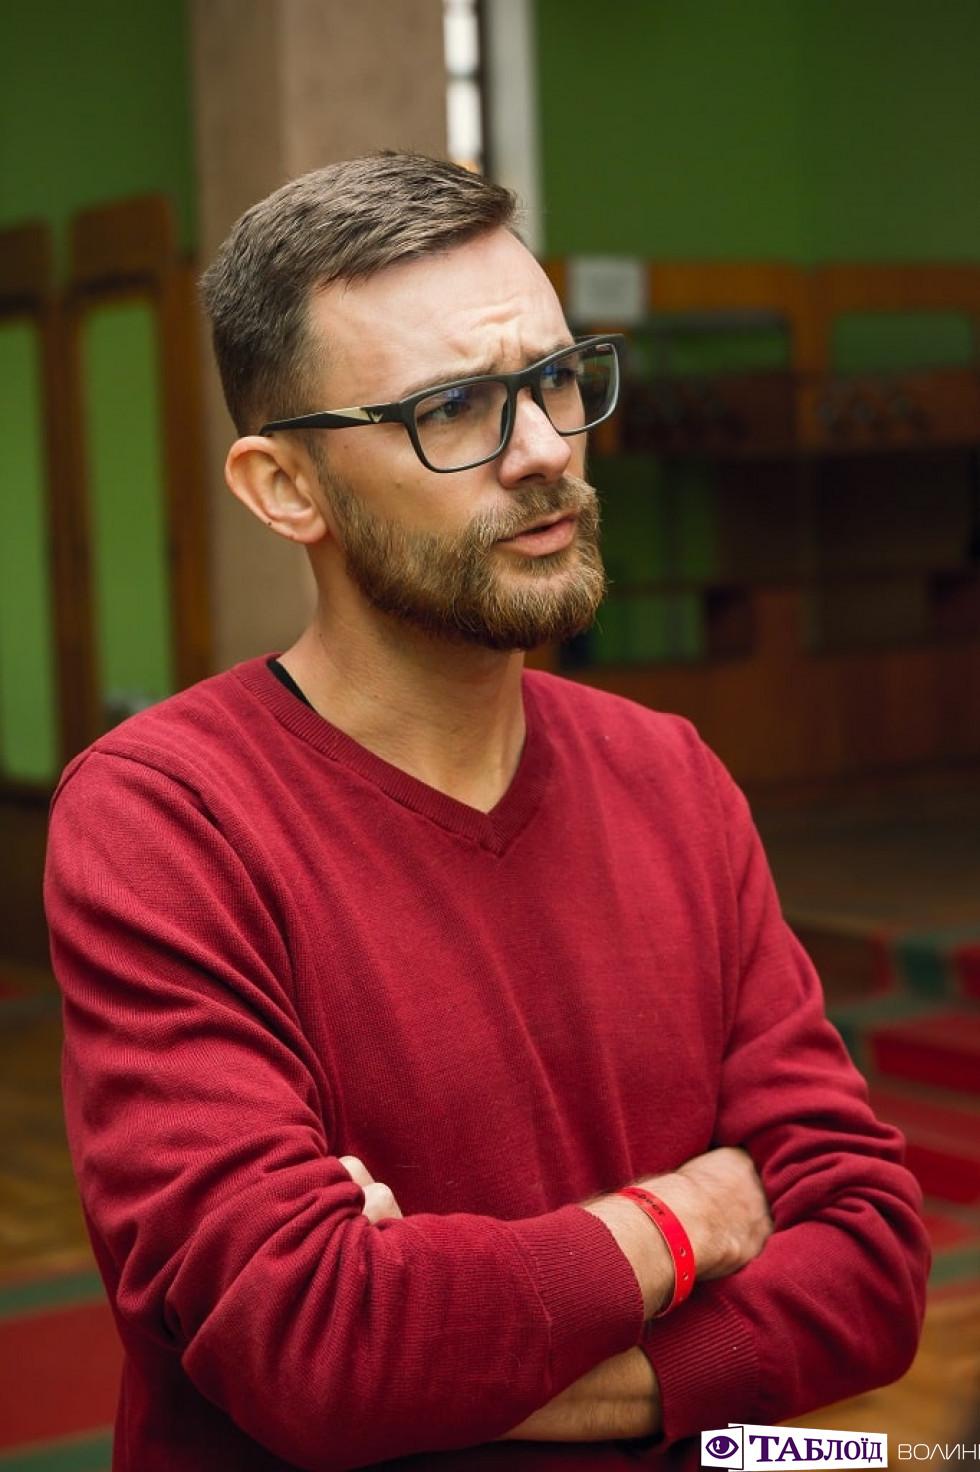 Розмова з письменником Павлом Коробчуком